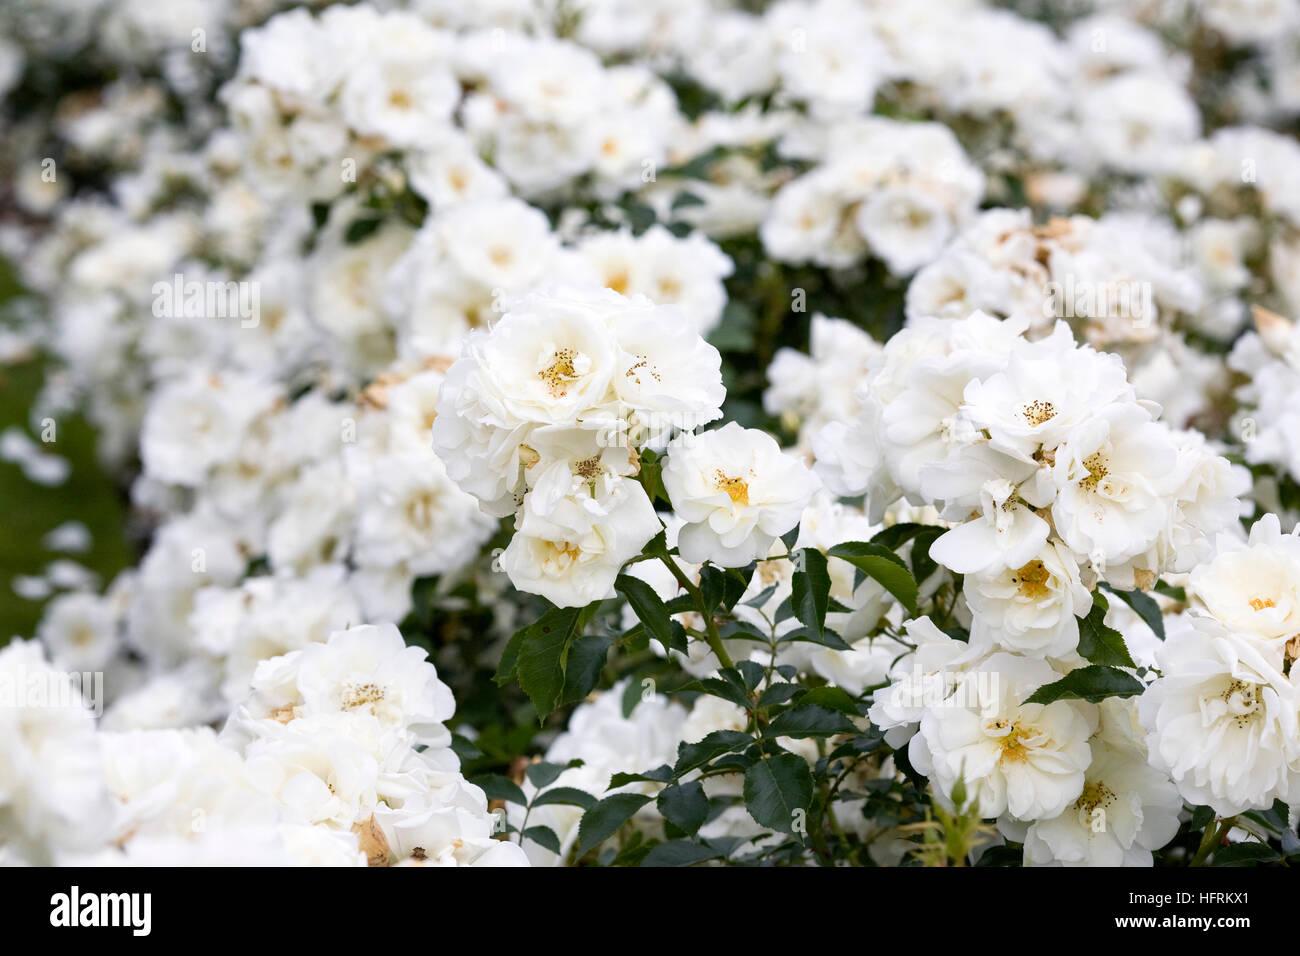 Rose flower carpet stock photos rose flower carpet stock images rosa flower carpet white noaschnee mightylinksfo